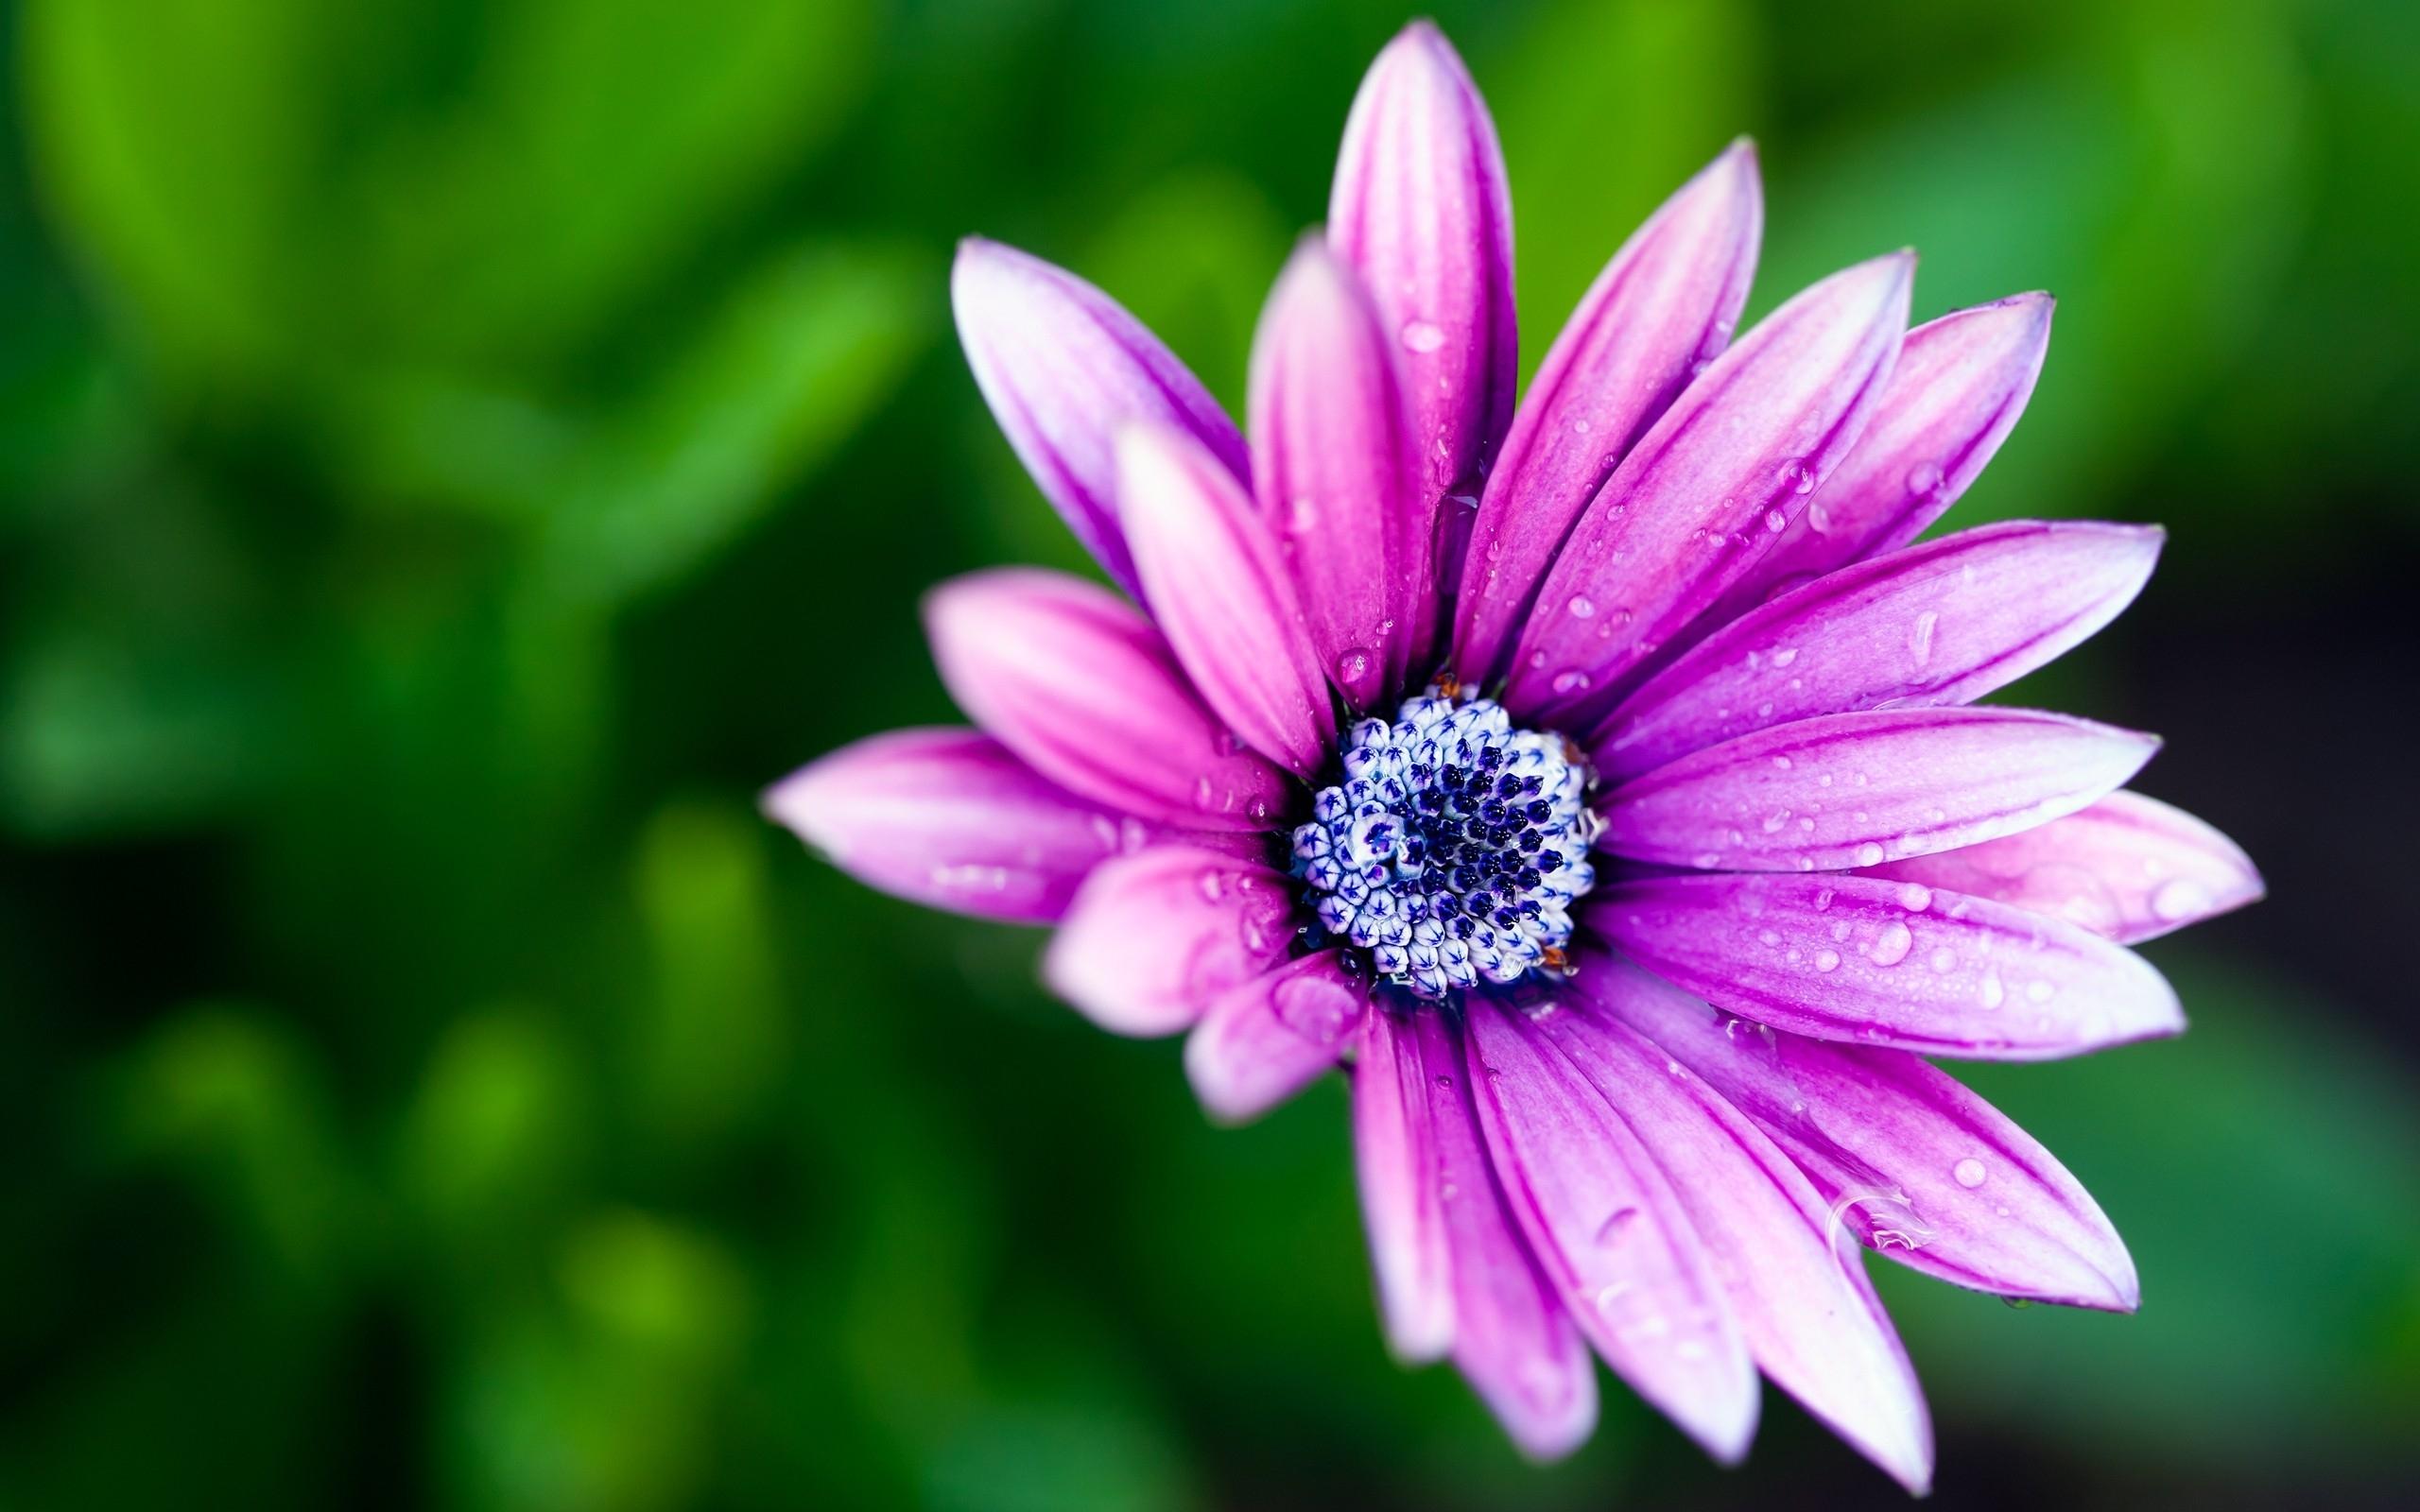 Stunning Flower Petals